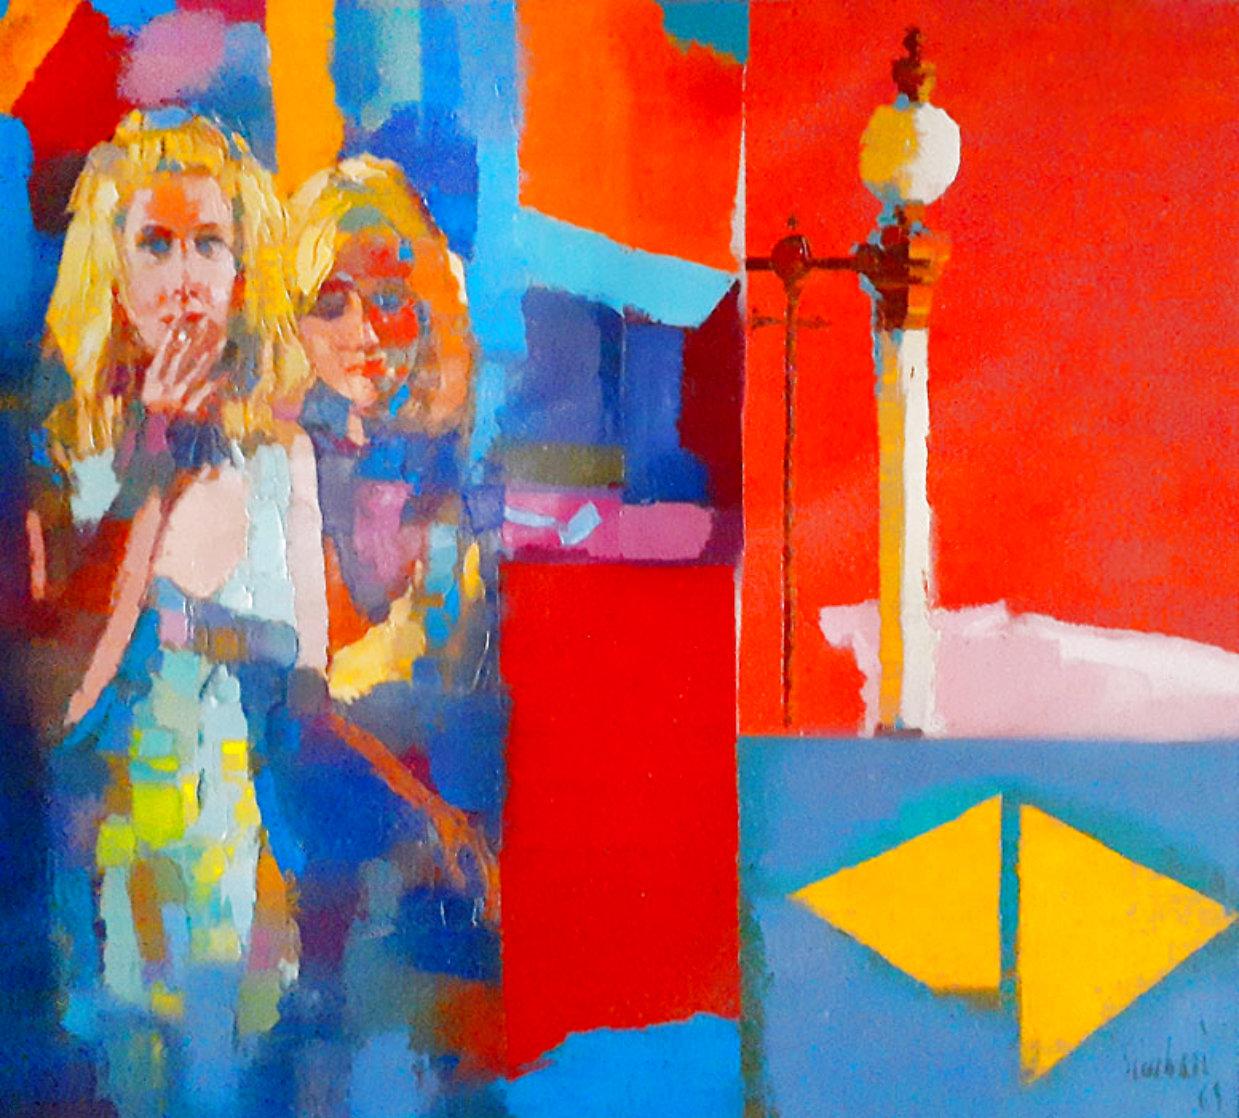 Red Room 44x44 Huge Original Painting by Nicola Simbari